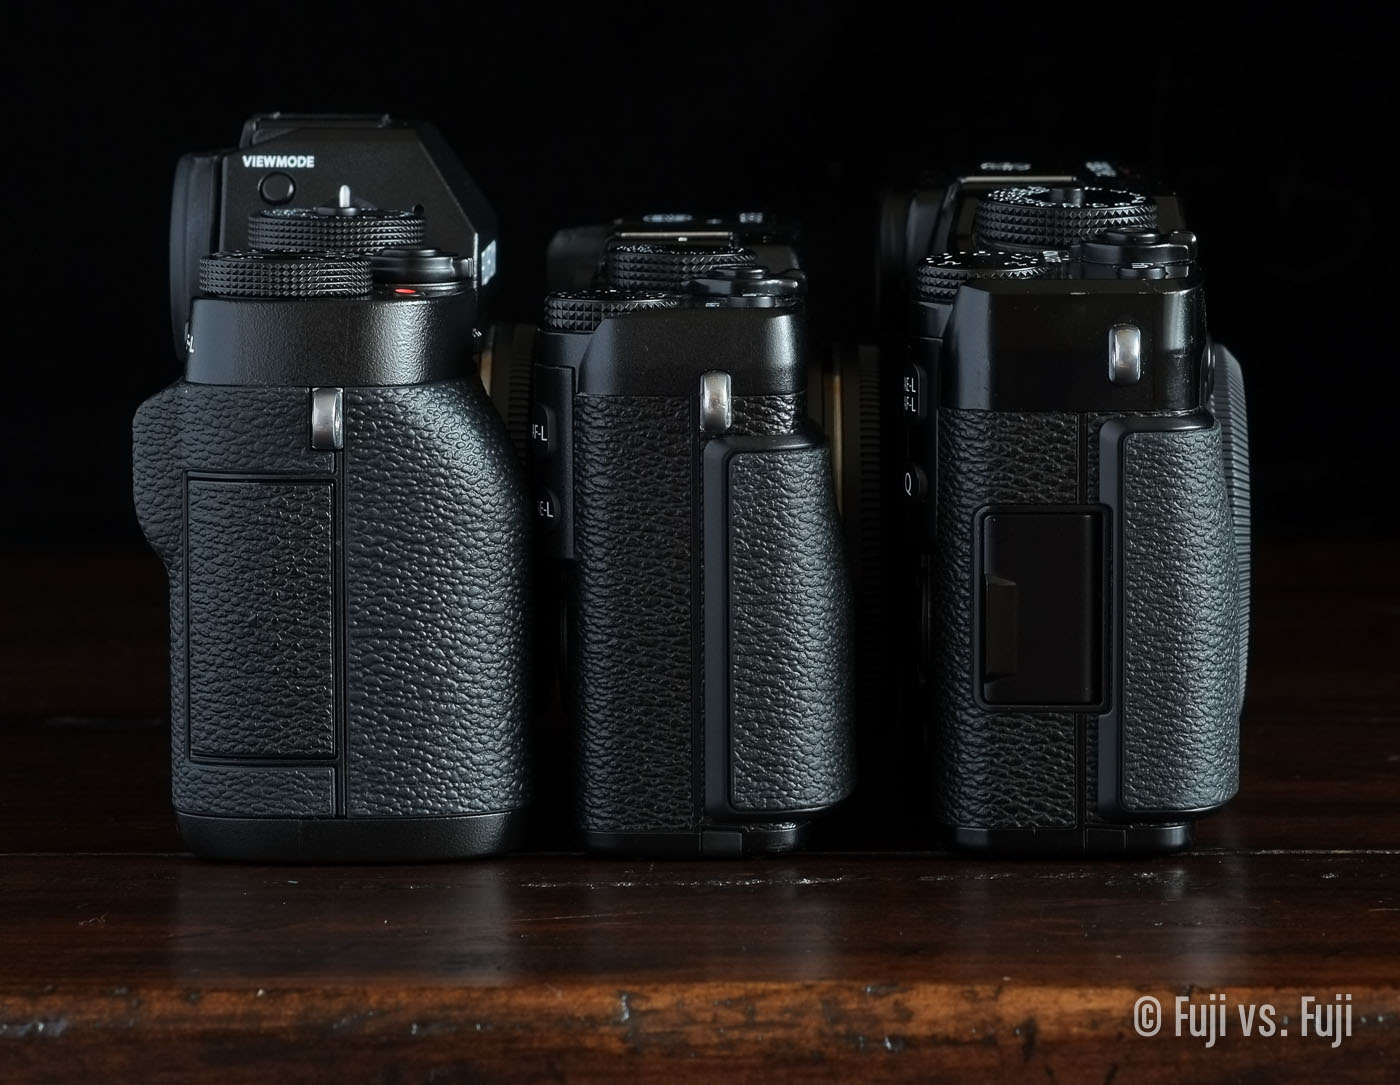 TheFujifilm X-T1, X-E2, and X-Pro1 – grip side